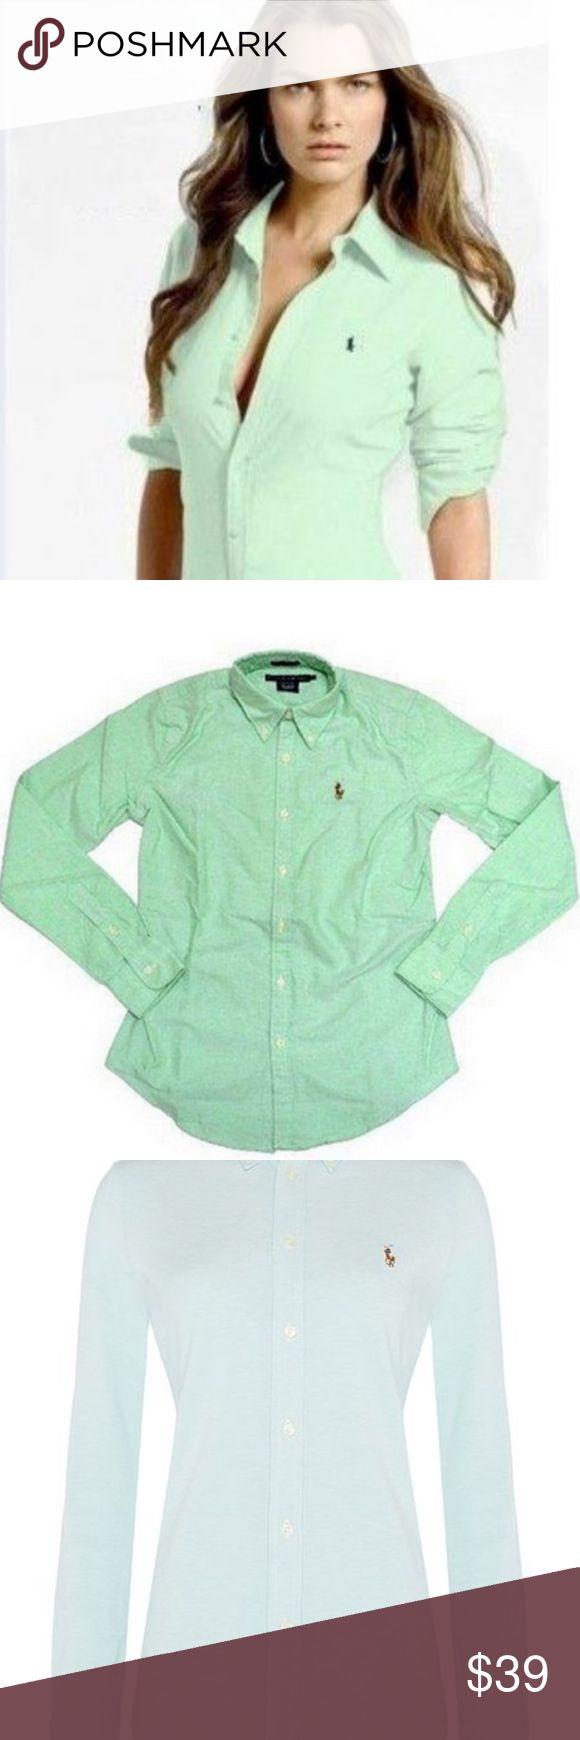 Ralph Lauren Green Slim Oxford Womens Ralph Lauren. Light green. Knit cotton Oxford. Button down. Polo emblem.  Size 0. Slim fit. Excellent condition - no signs of wear. Ralph Lauren Tops Button Down Shirts